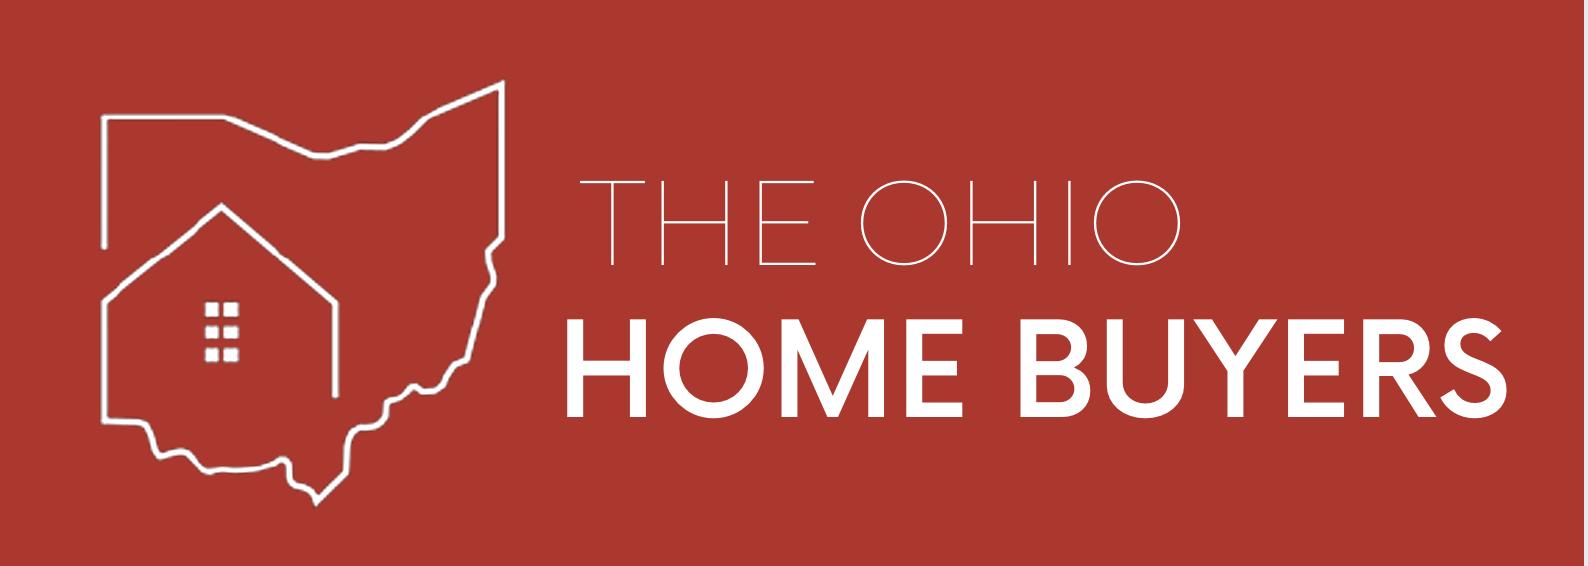 The Ohio Home Buyers  logo